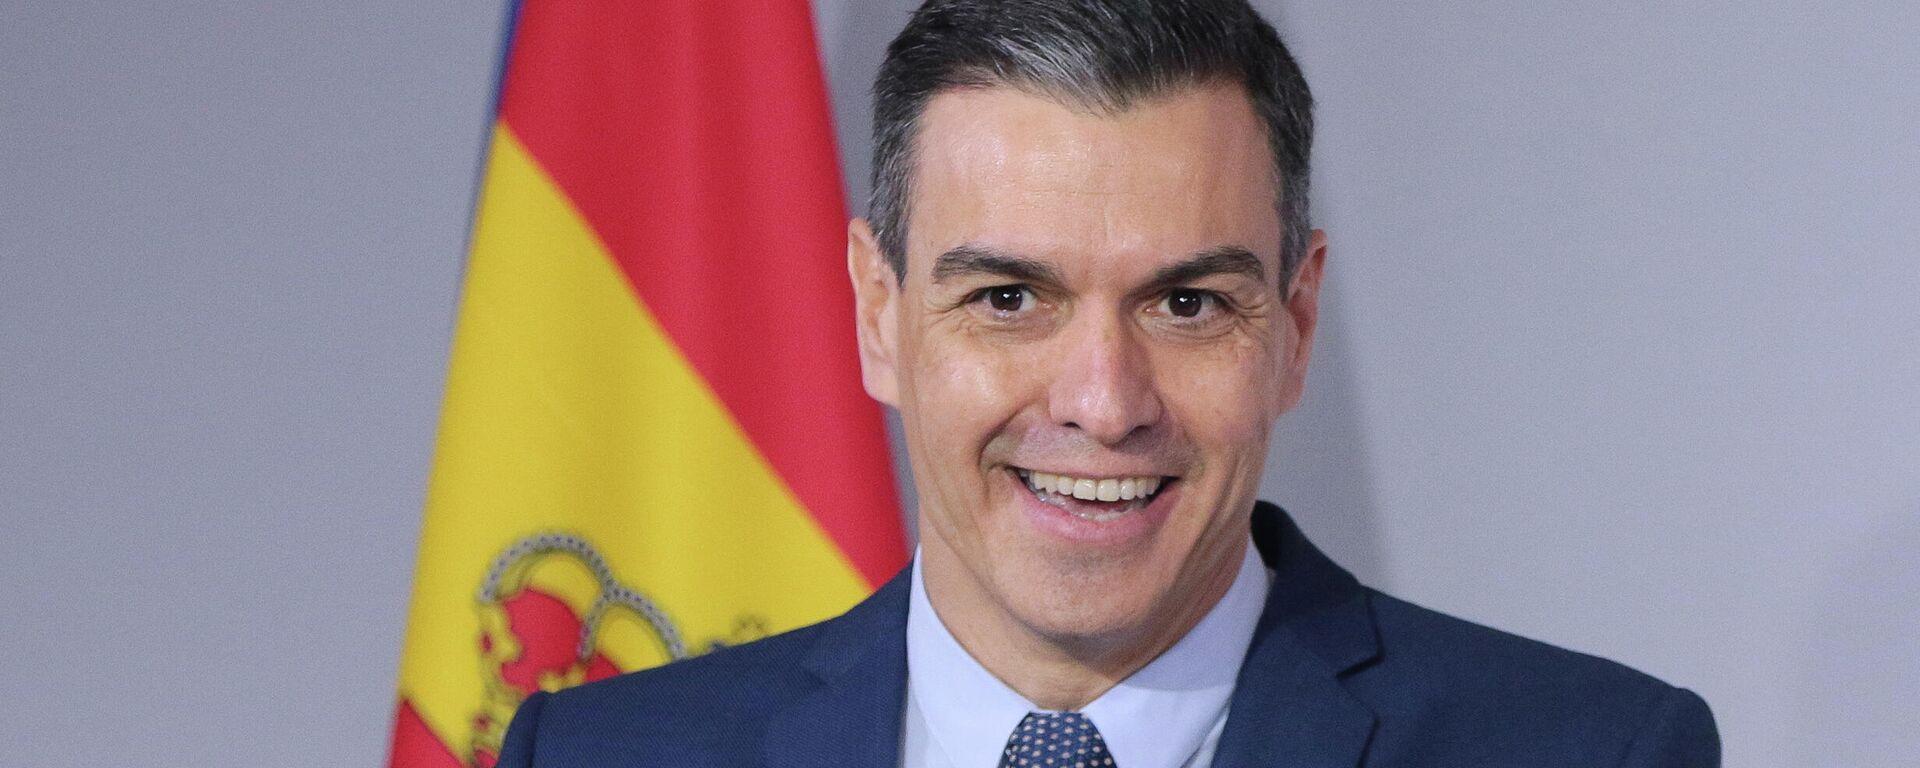 Pedro Sánchez, presidente del Gobierno de España - Sputnik Mundo, 1920, 21.05.2021